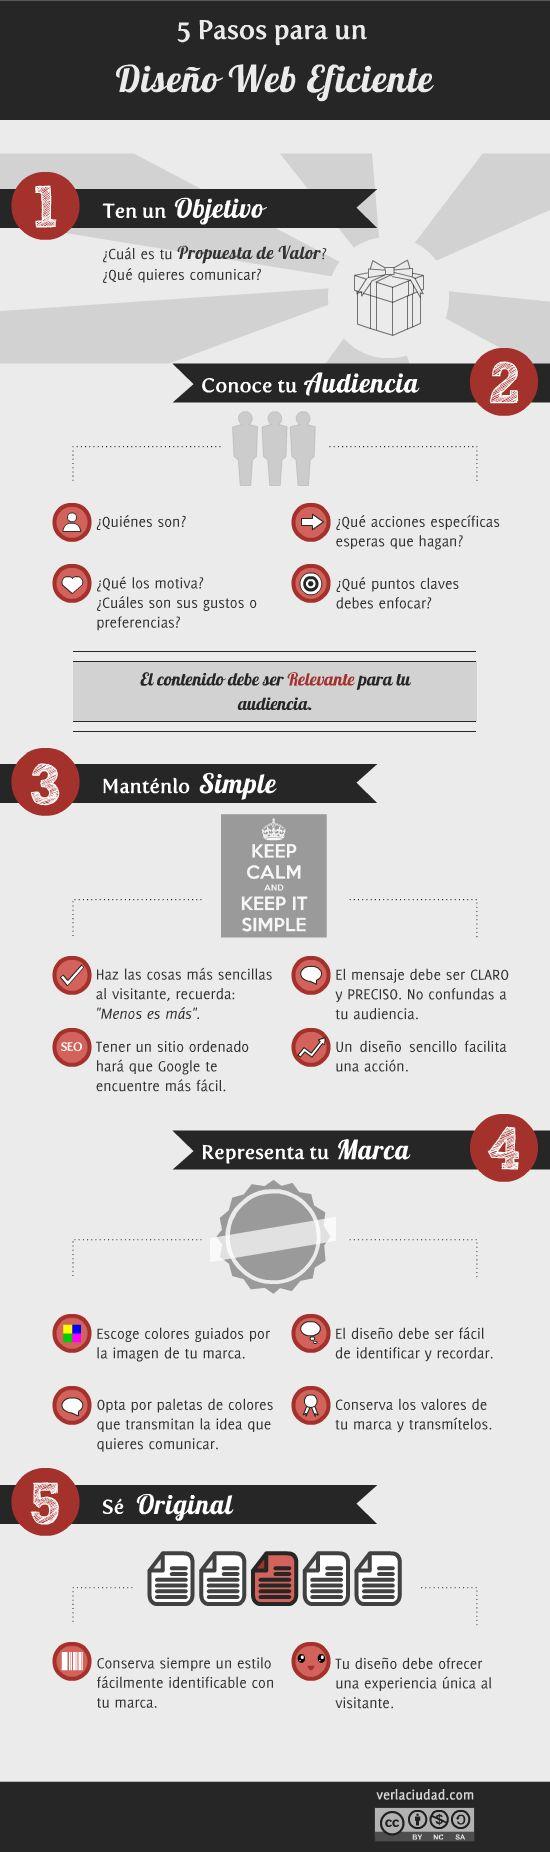 5 pasos para un diseño web eficiente #infografia #infographic #design #internet